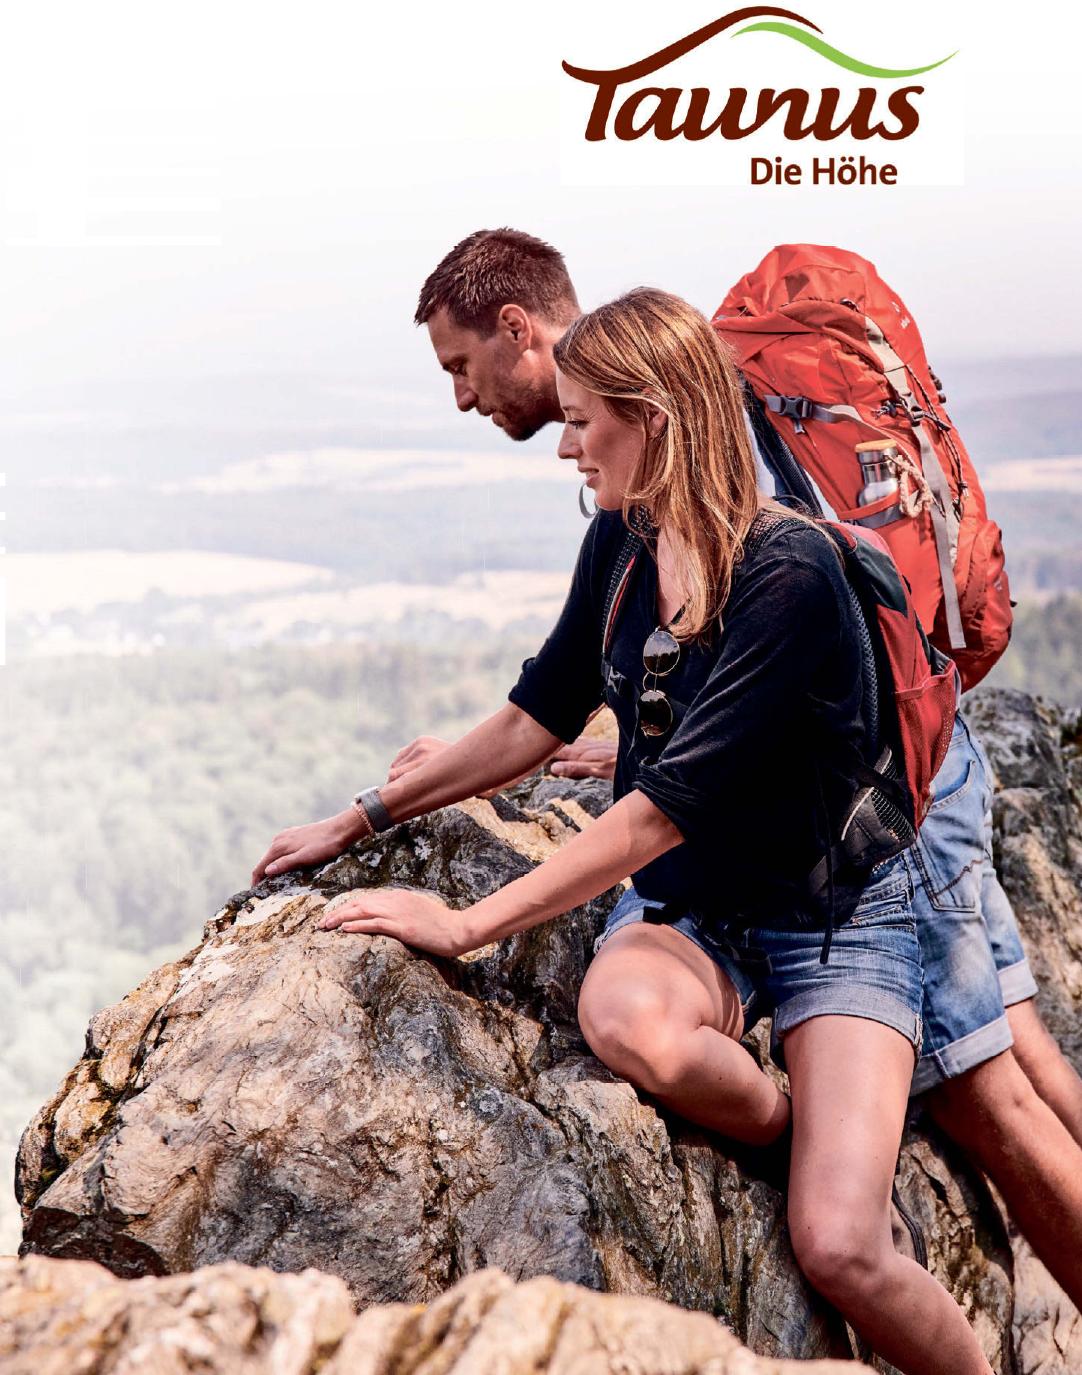 Foto: HA Hessen Tourismus/Roman Knie